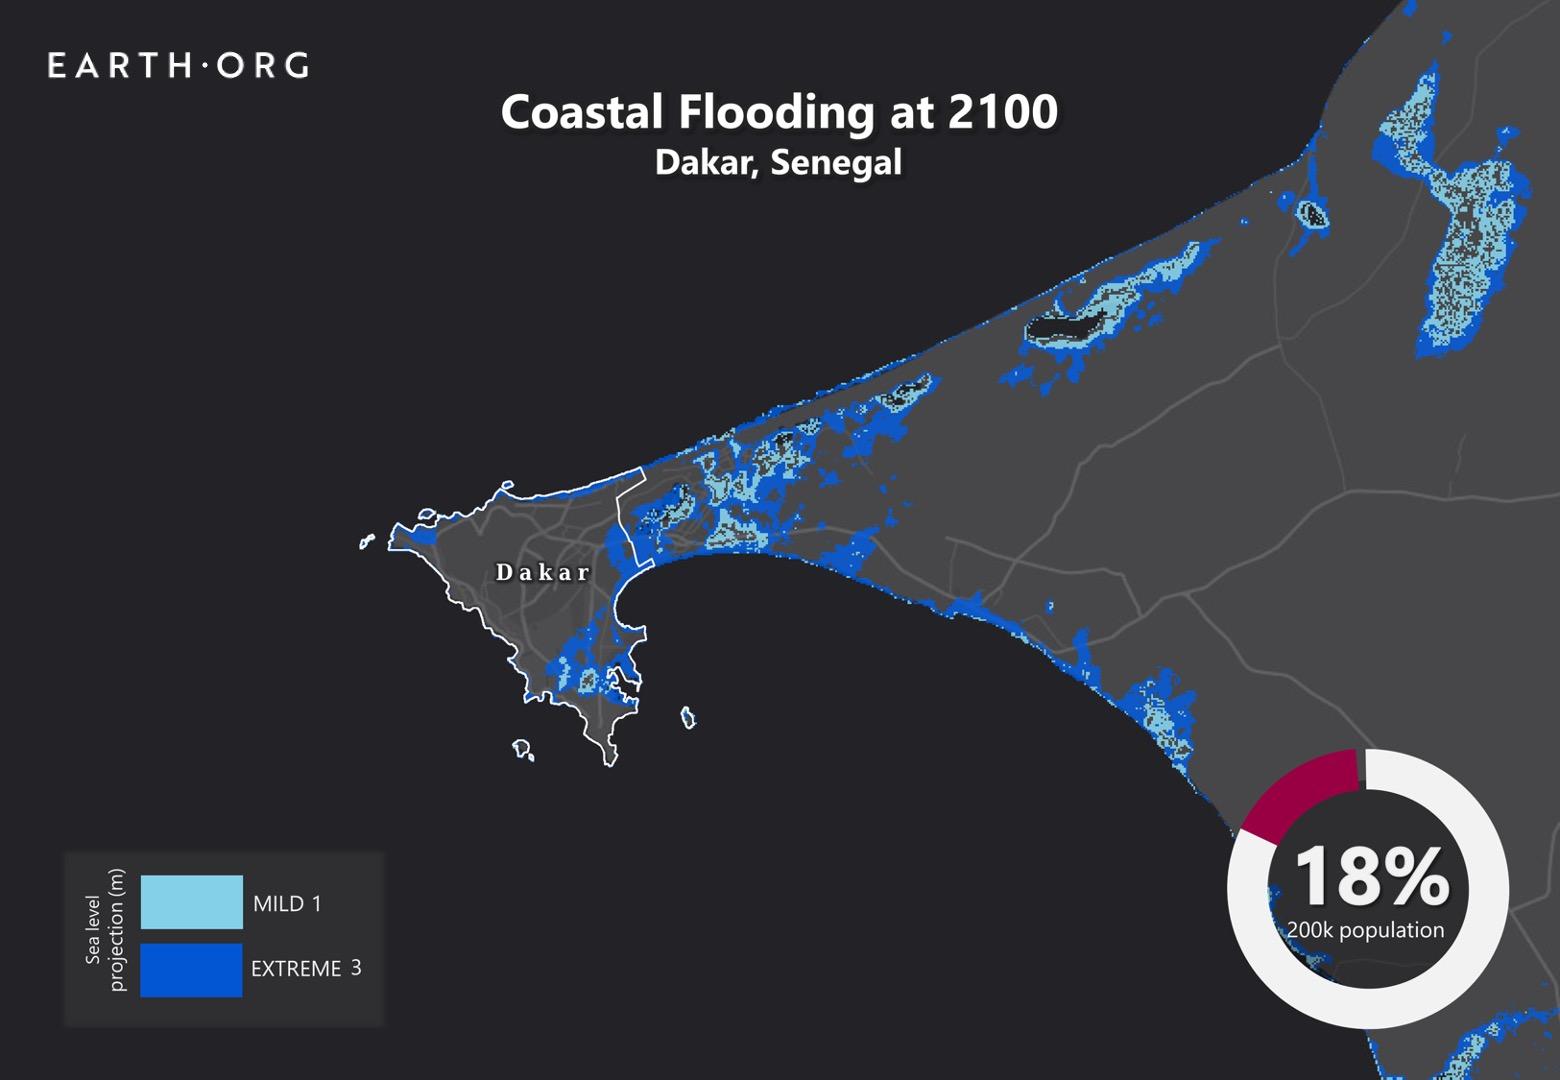 sea level rise by 2100 dakar